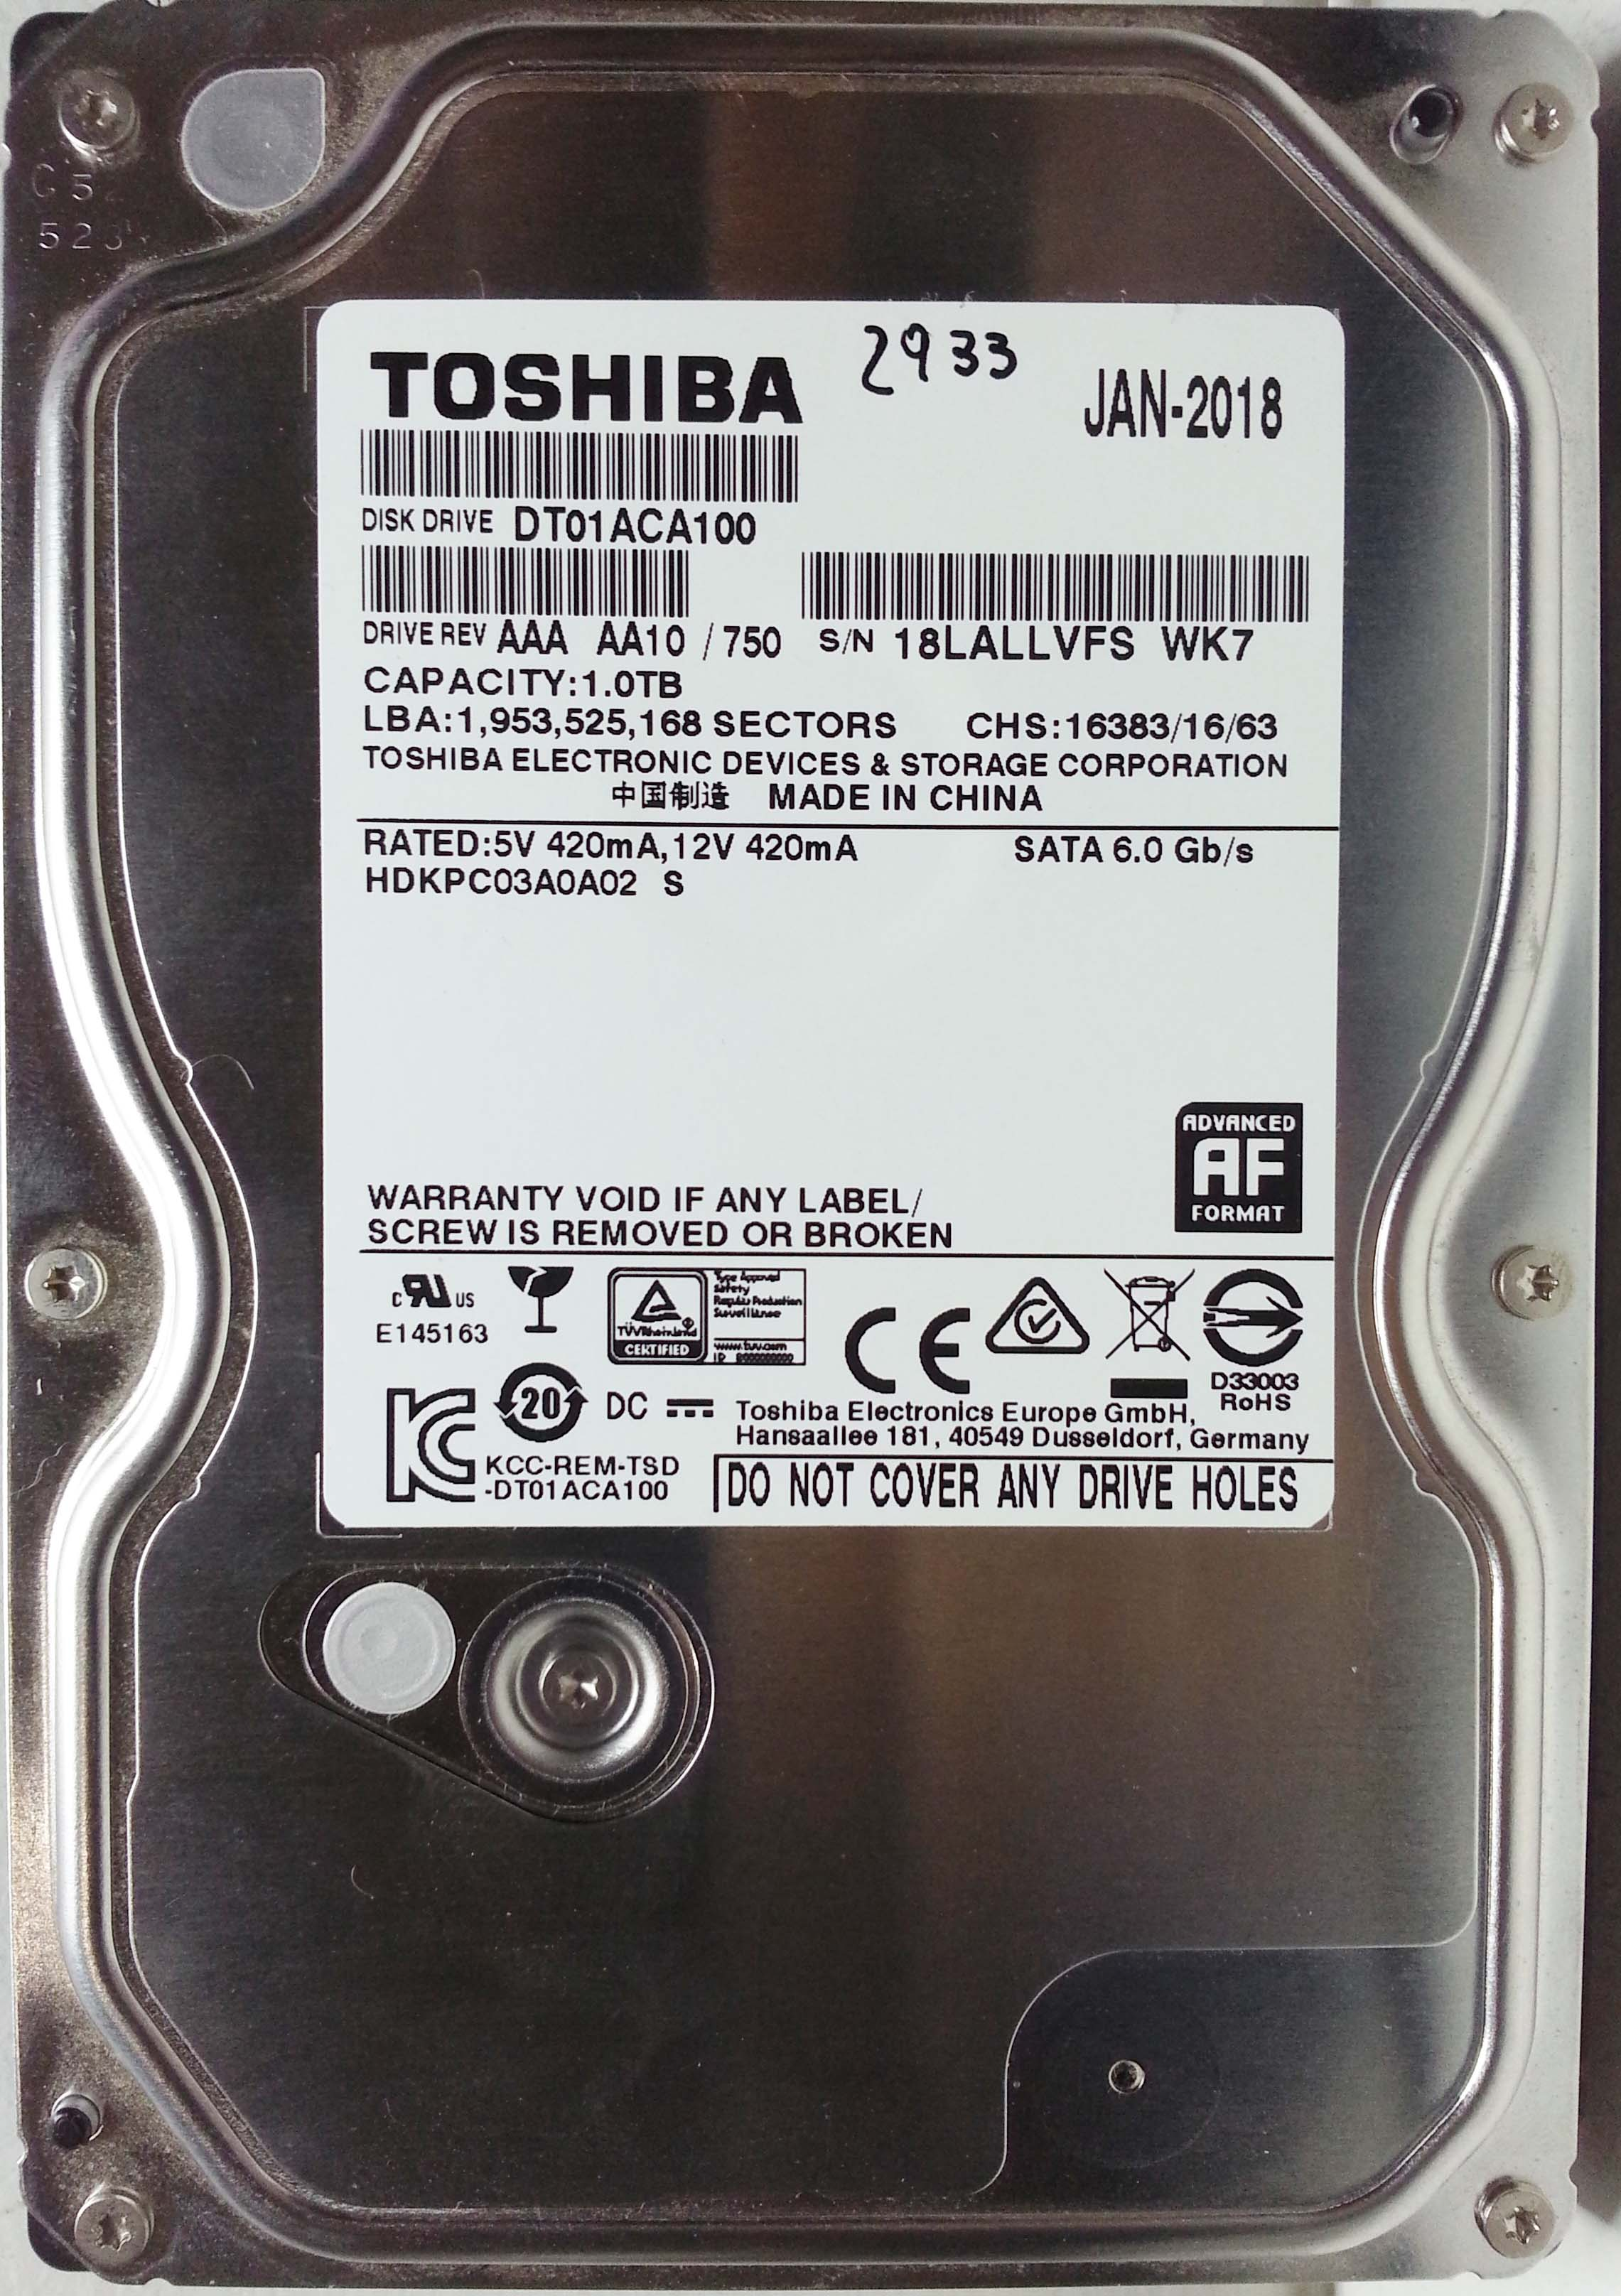 toshiba-DT01ACA100